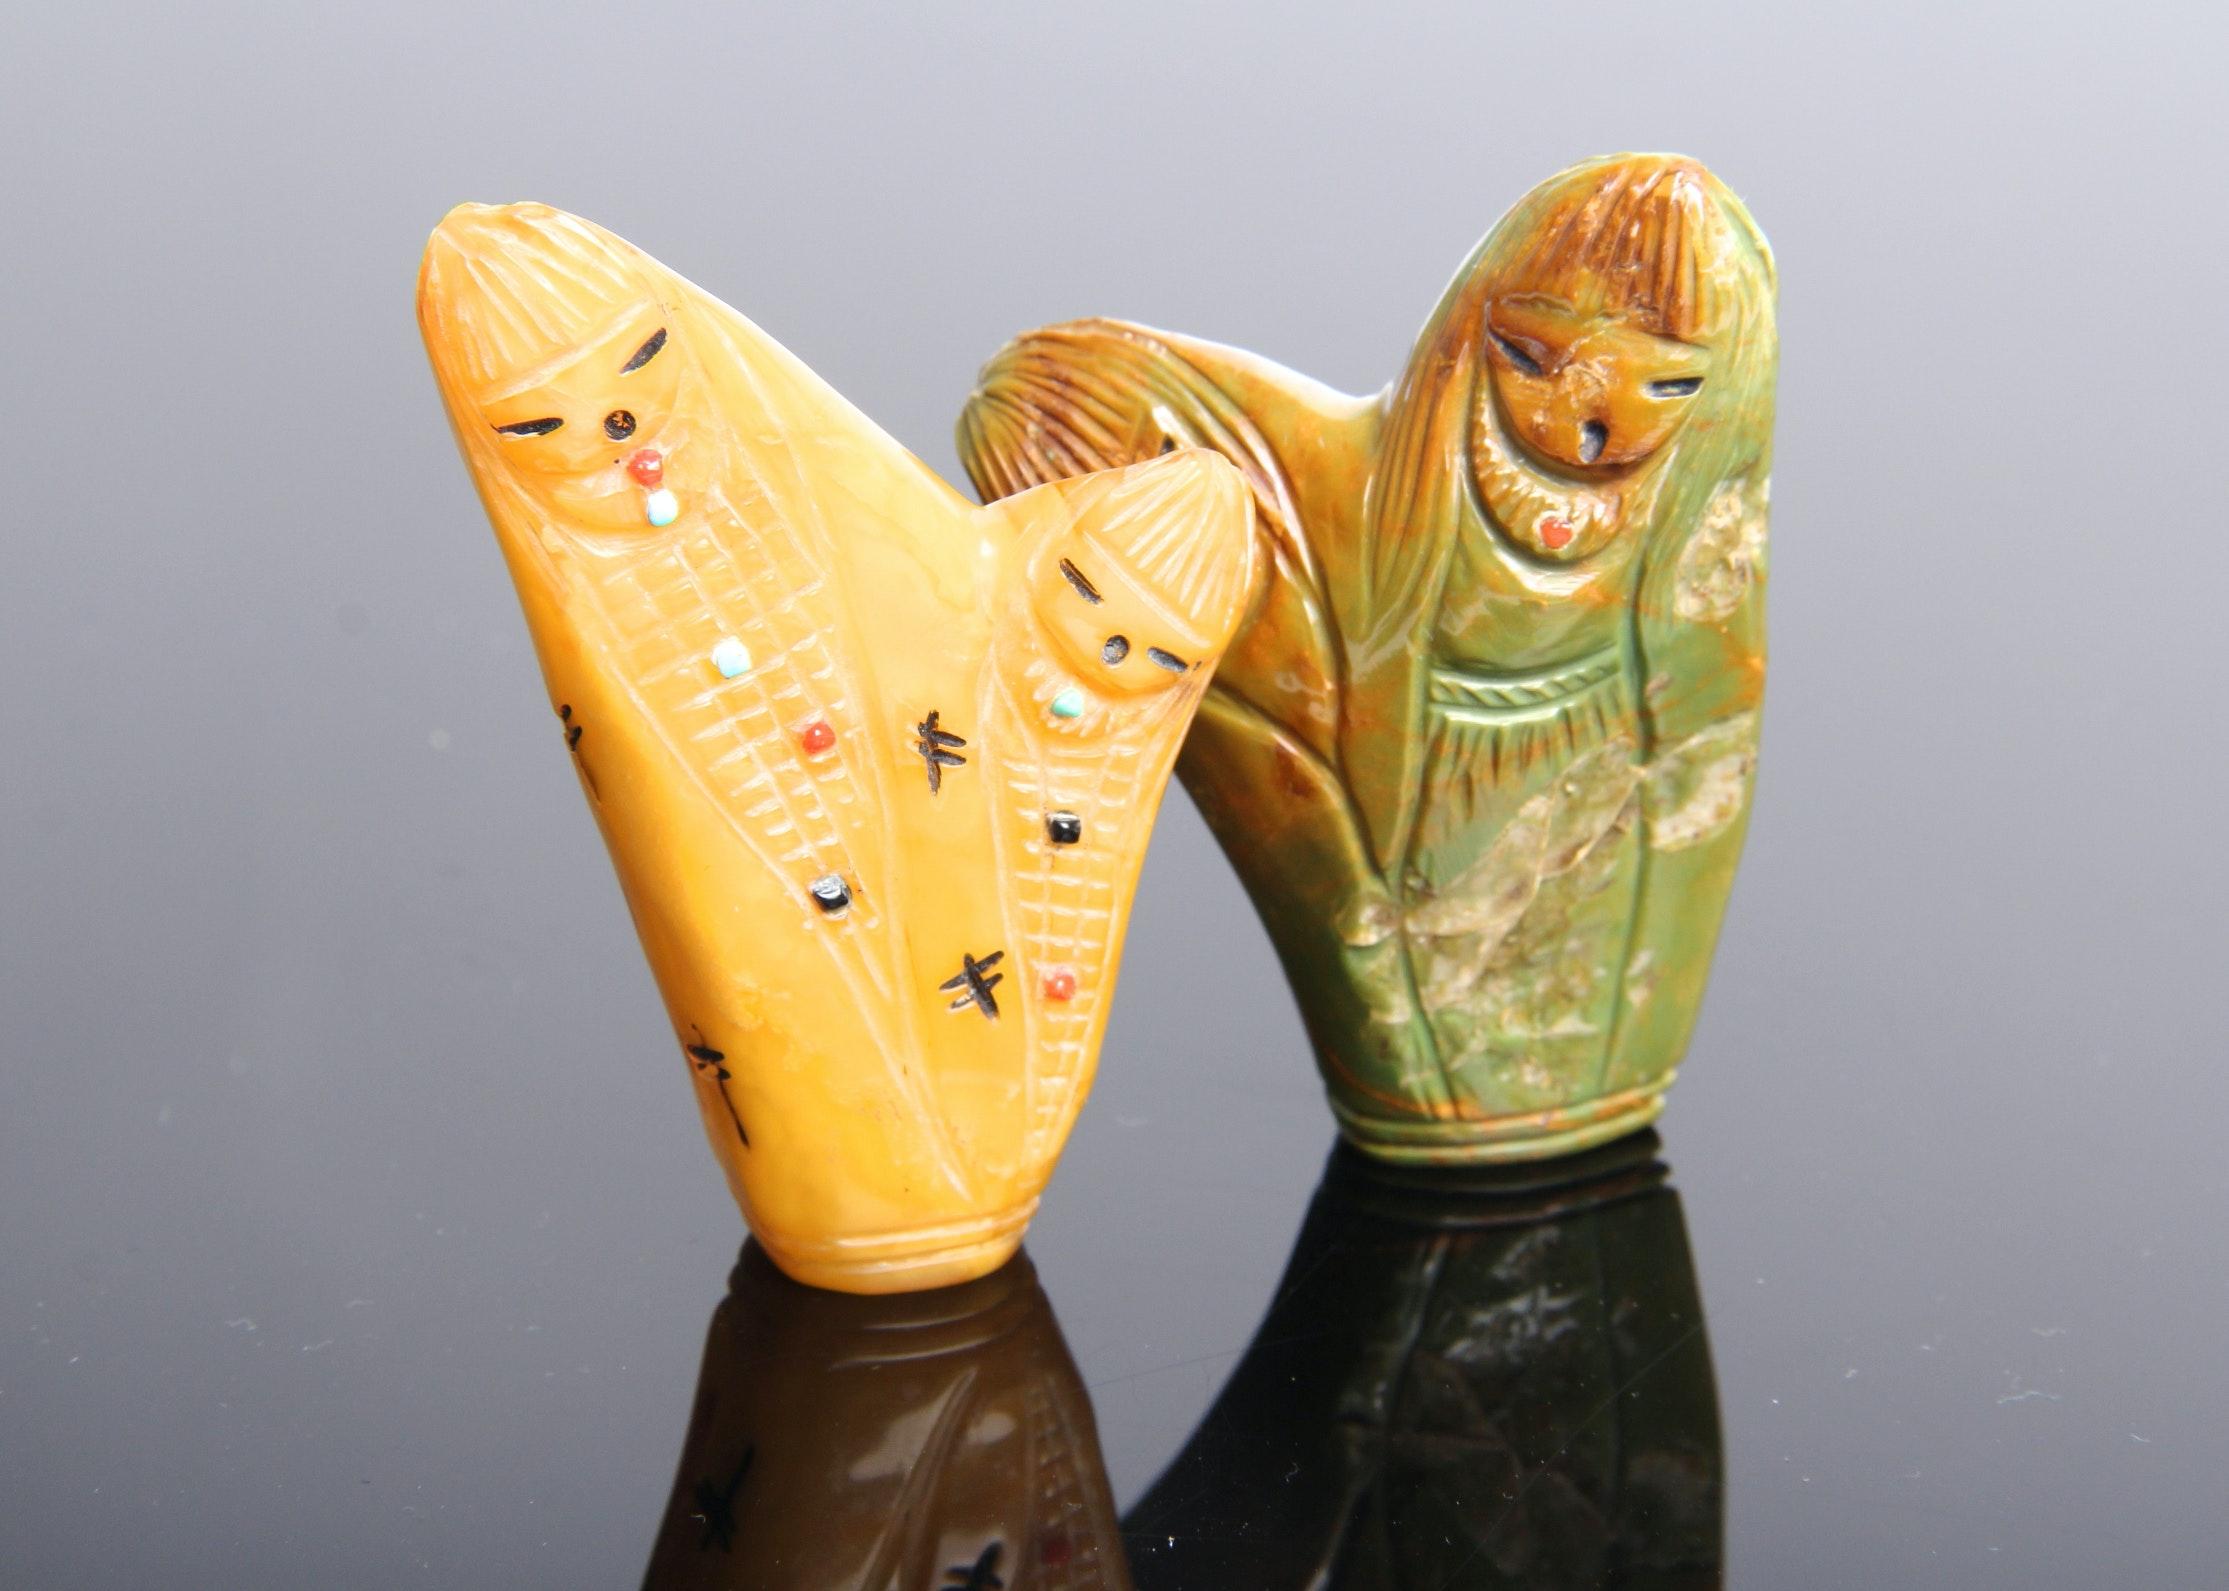 Corn maiden fetish